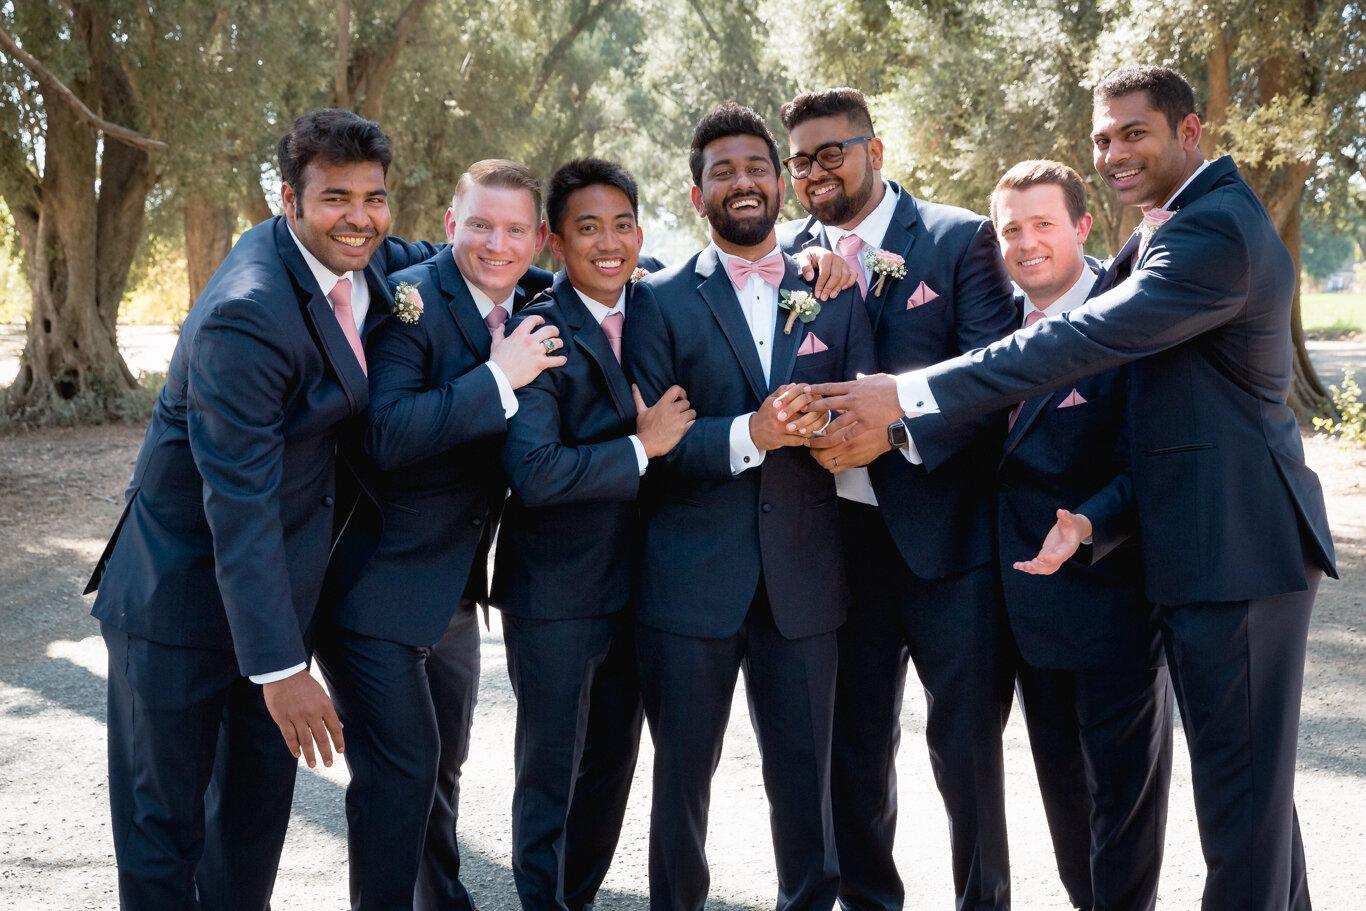 2019.08.24_Emily-Ashir-Wedding-at-the-Maples-5360.jpg